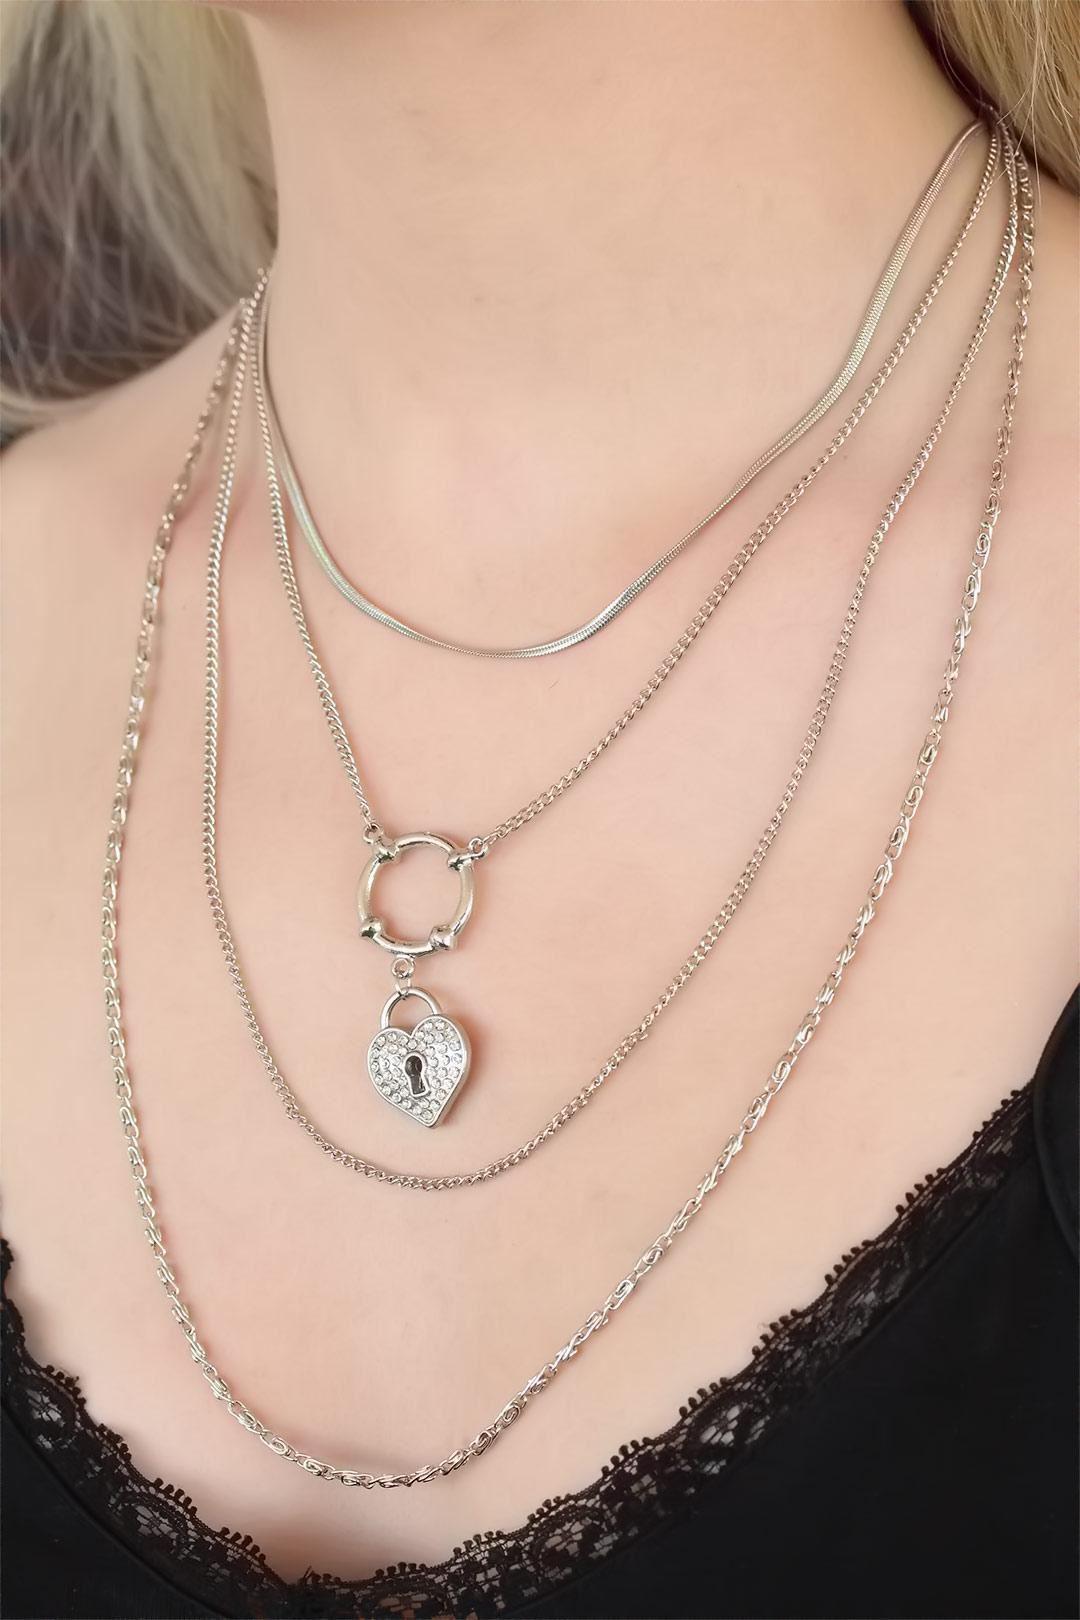 Kalpli Detaylı Silver Renk Renk Kolye